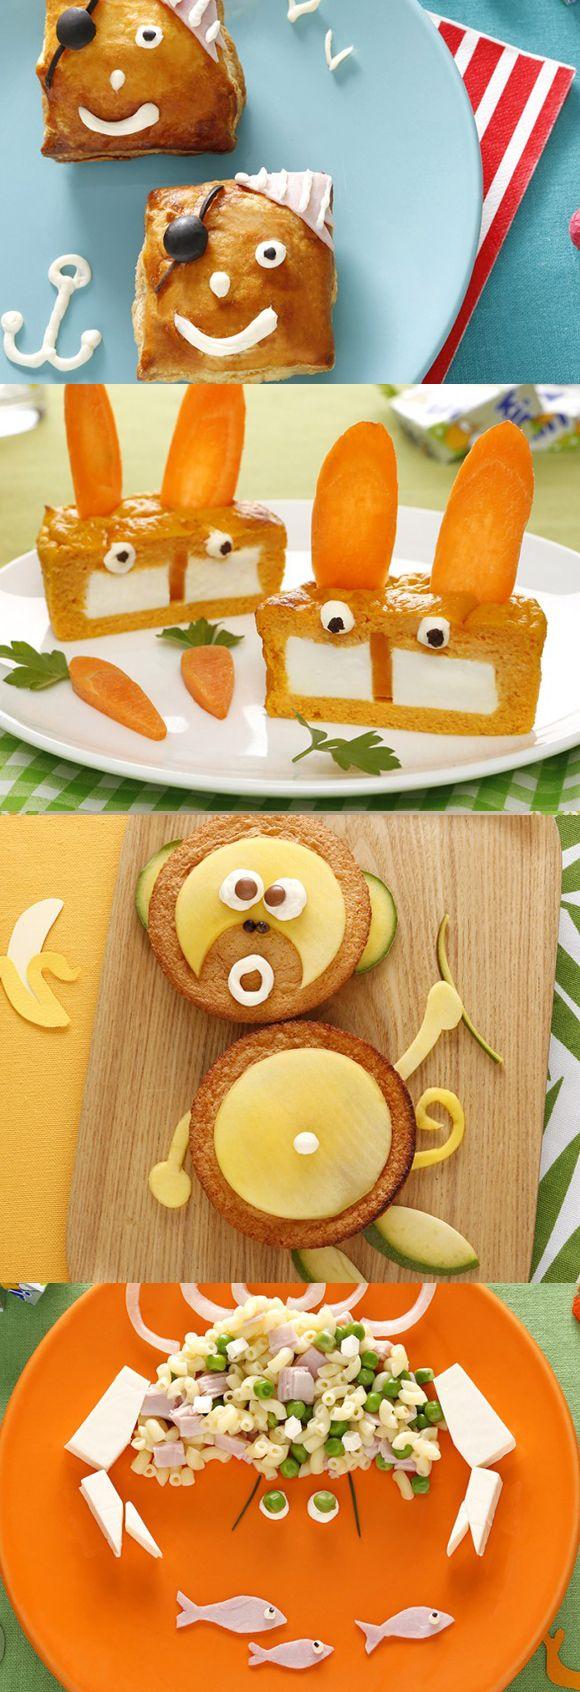 Des dizaines de recettes rigolotes & gourmands avec Kiri pour amuser petits et grands gourmands :) #kiri #cream #cheese #fromage #fun #food #art #recette #recipe #gourmand #yummy #enfant #Kids #food #rigolo #cute #animals